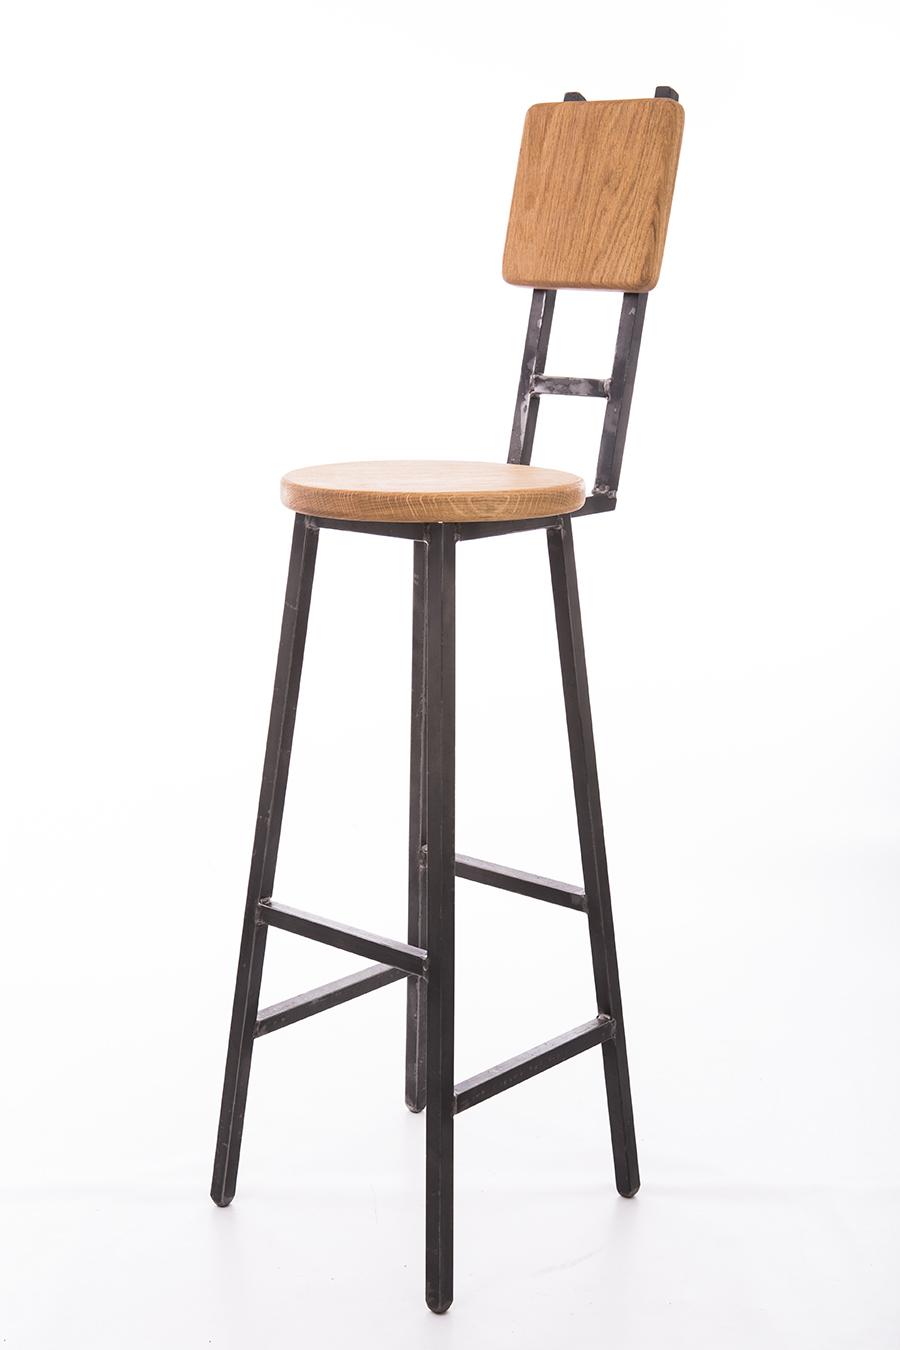 Brian Industrial Bar Stool With Two Bar Back Rest Paul Frampton Design Ltd